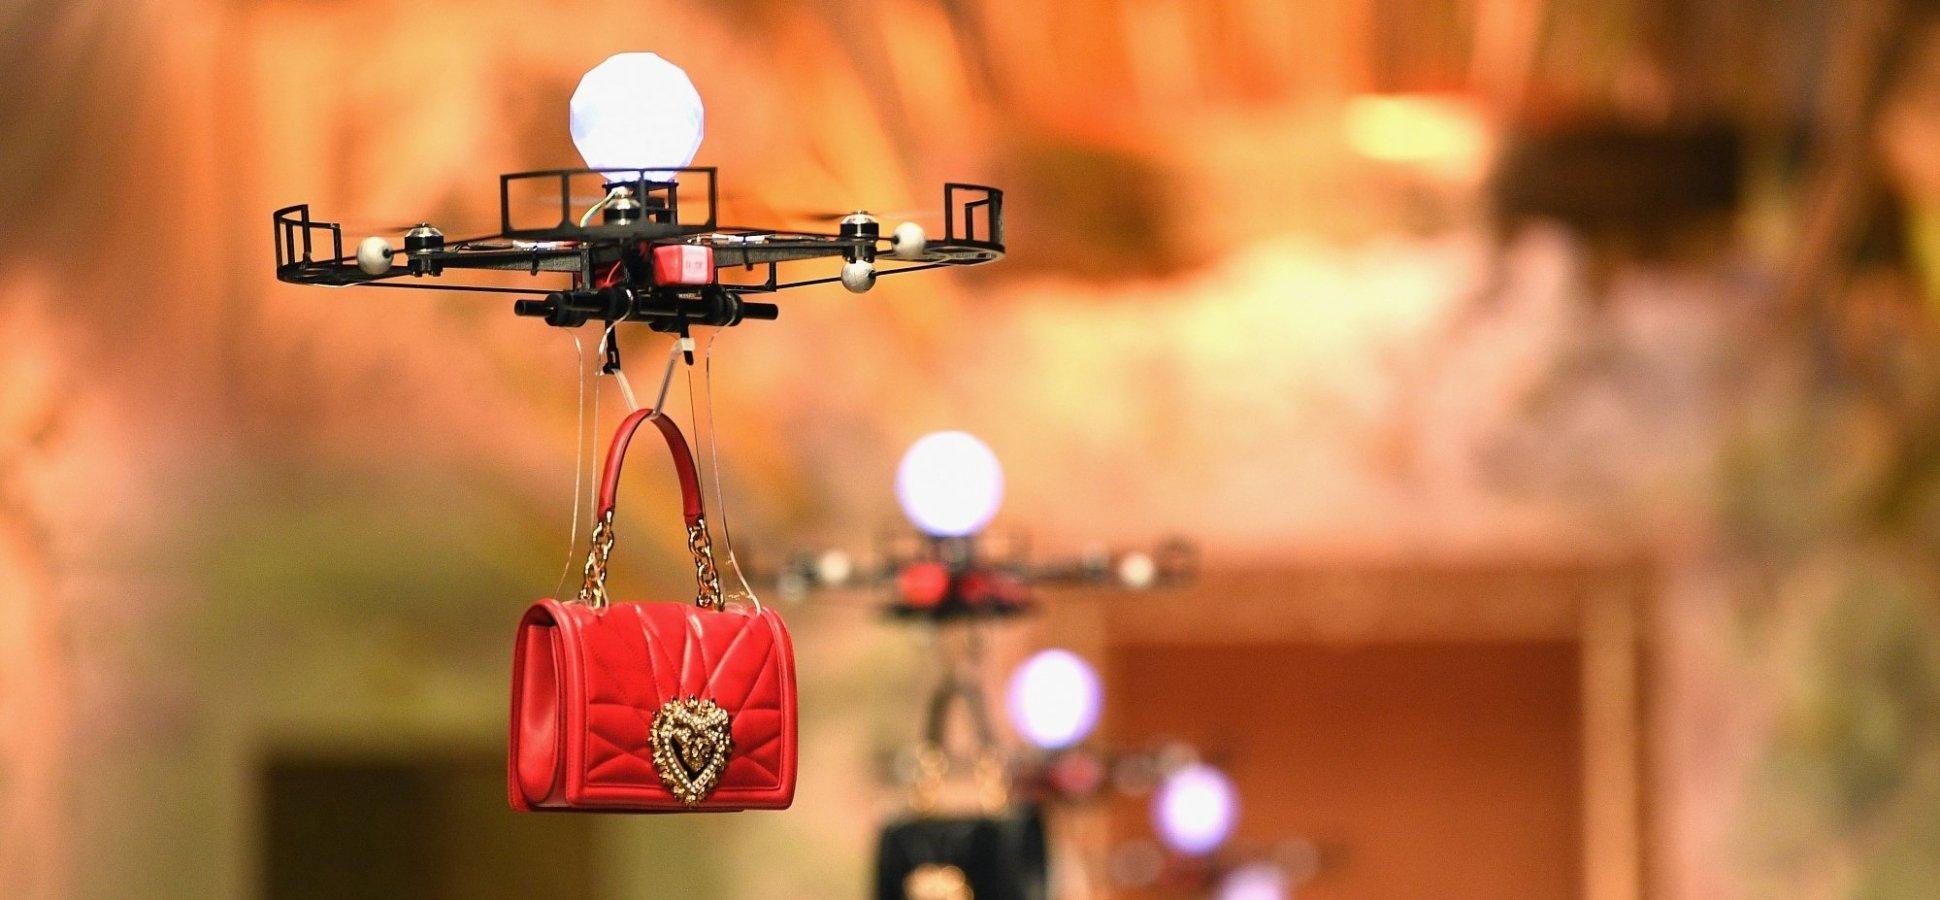 1a4086141a24 Drones Fly Dolce   Gabbana Handbags Down the Catwalk at Milan Fashion Week